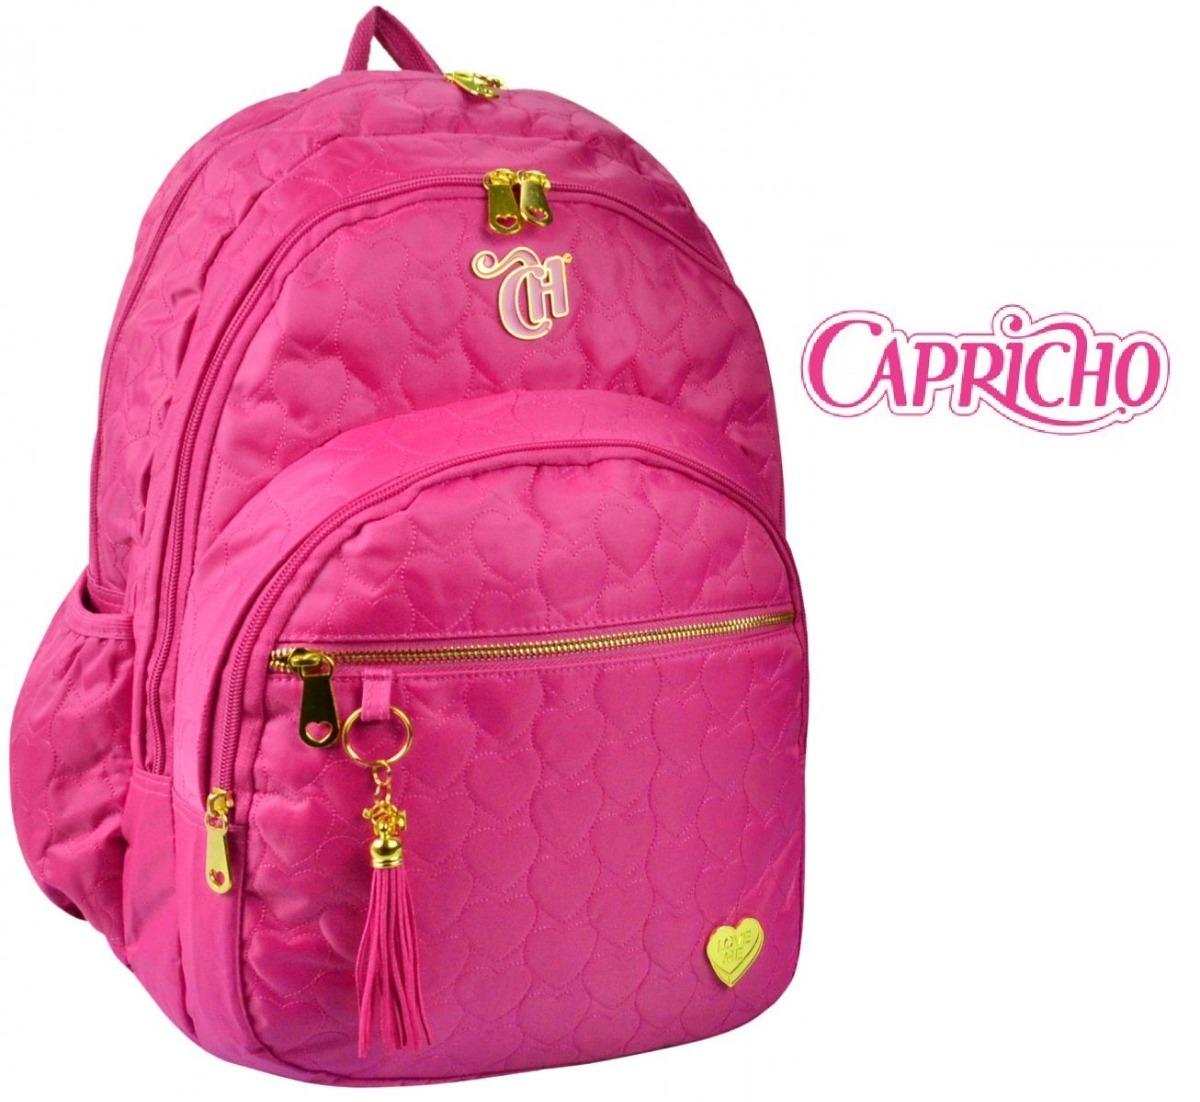 c209c4b26 mochila capricho love rosa pink g rosa 2018 original dmw. Carregando zoom.